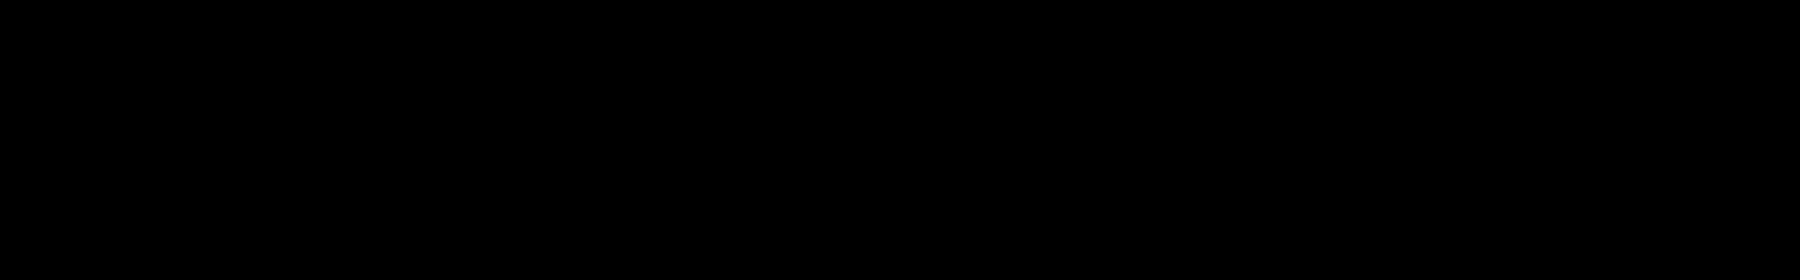 Torii 5 - Lofi Beats audio waveform